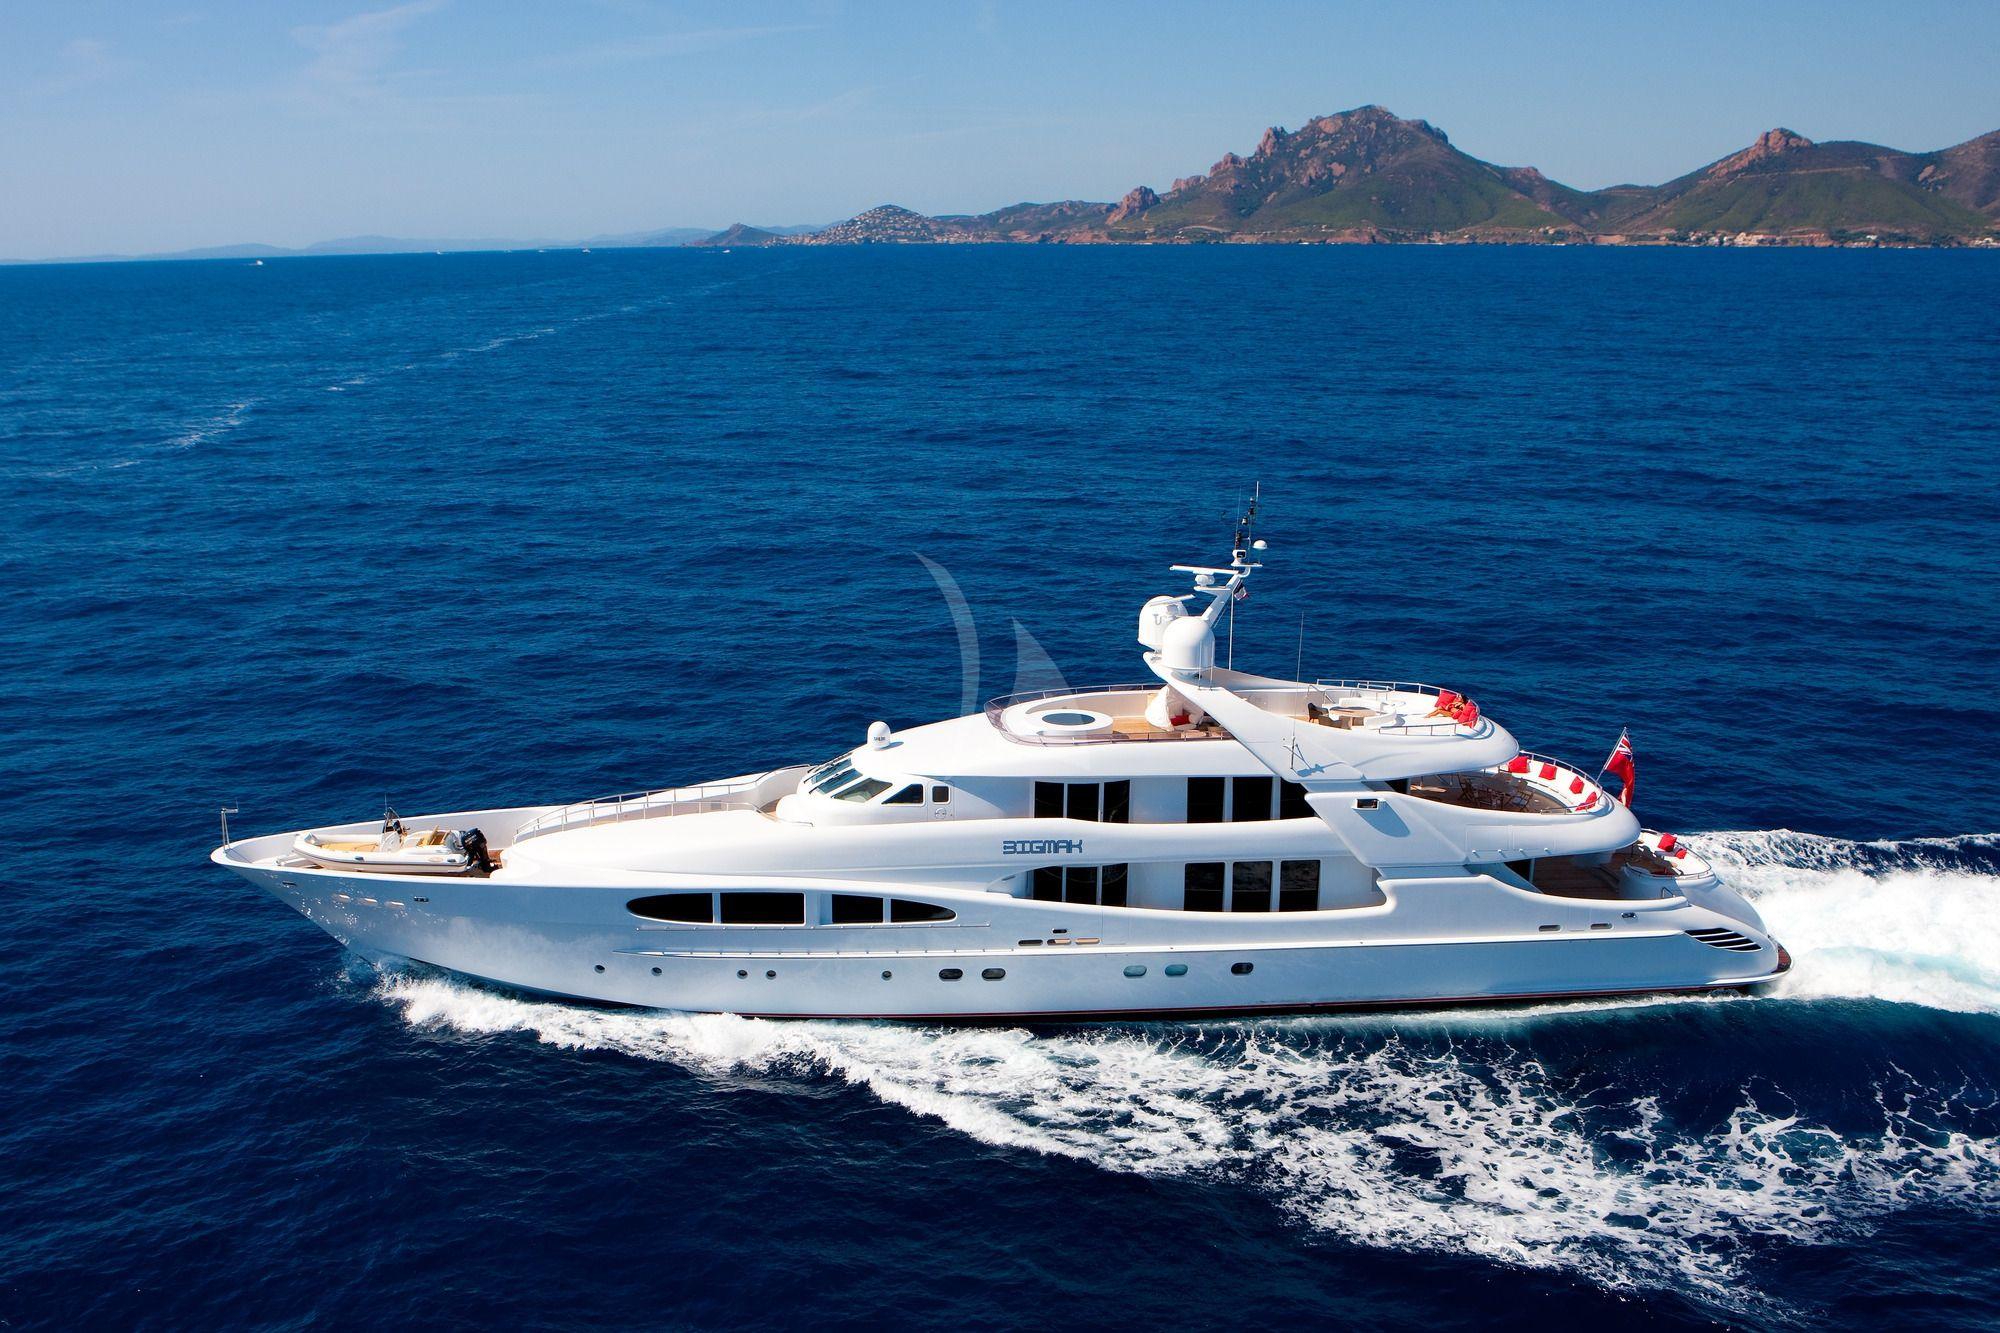 BLUE MAGIC - Heesen 156 - 5 Cabins - Cannes - Antibes - St Tropez - Monaco